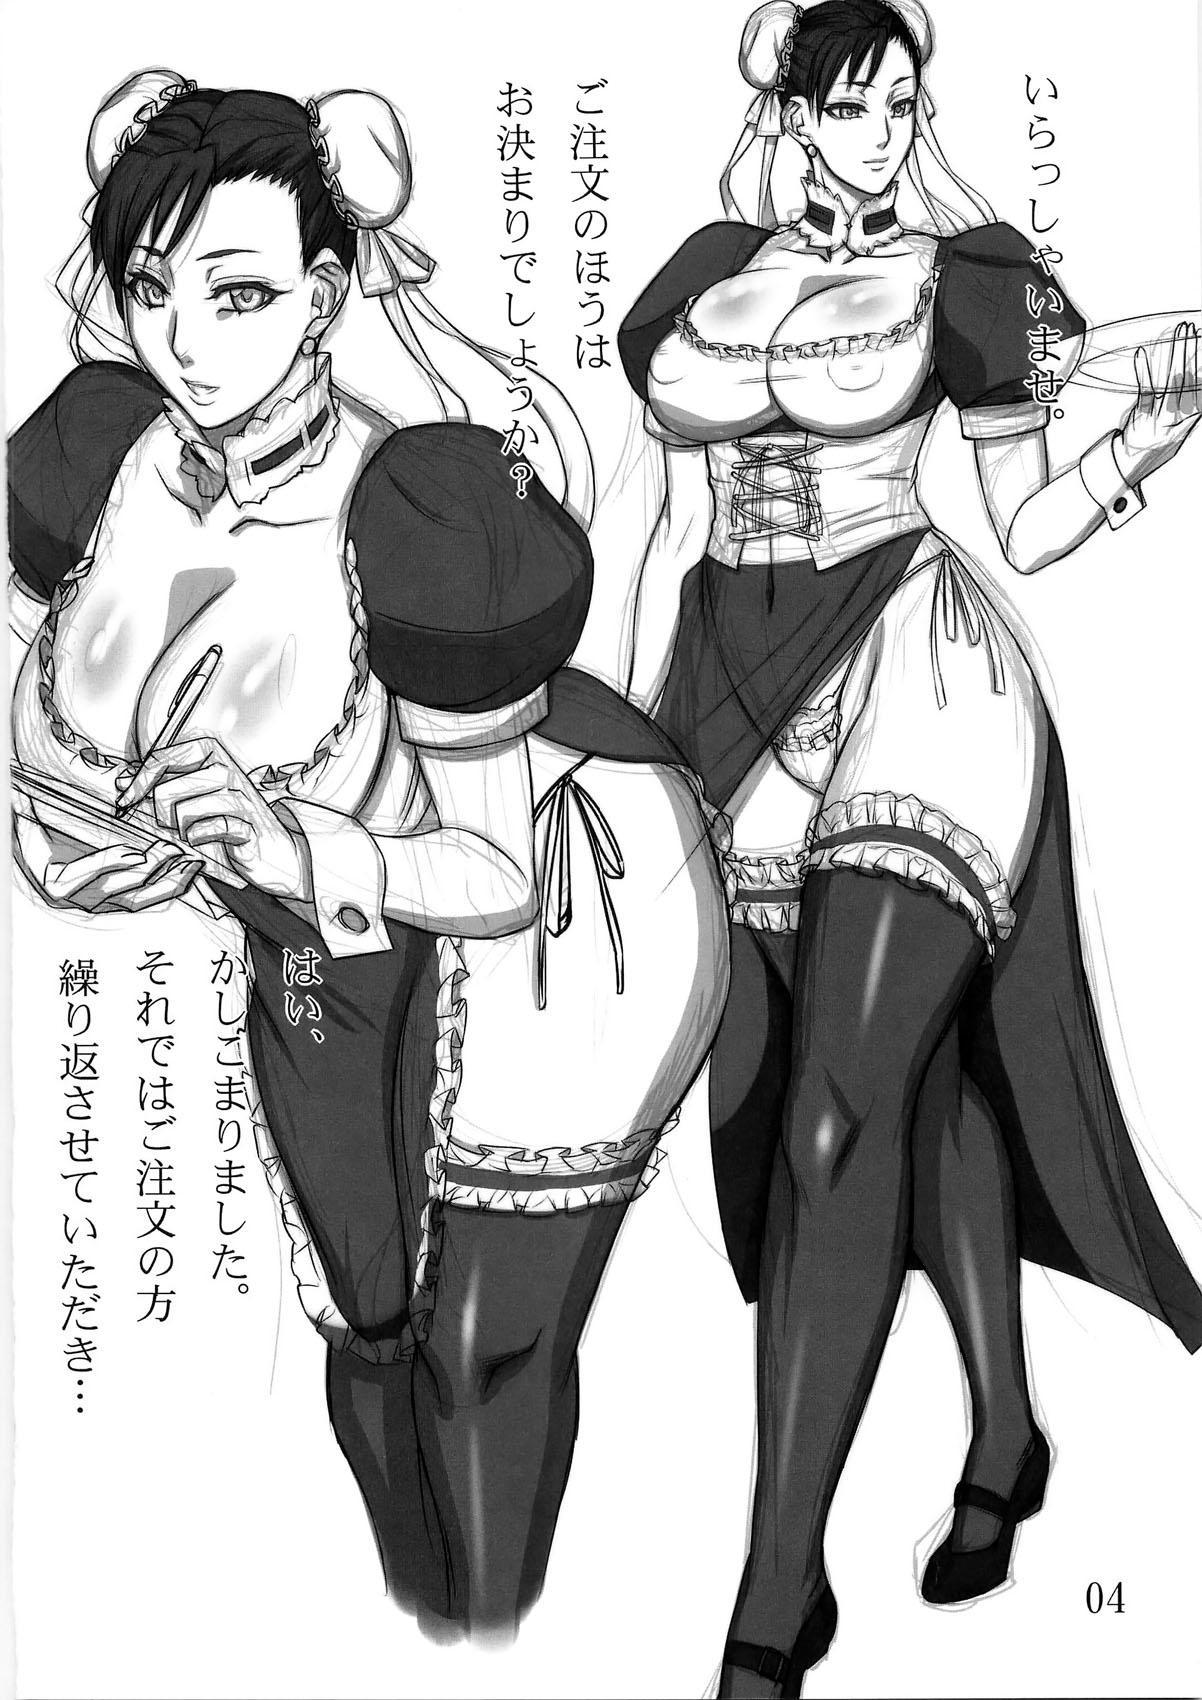 Maid Kurorei. 3